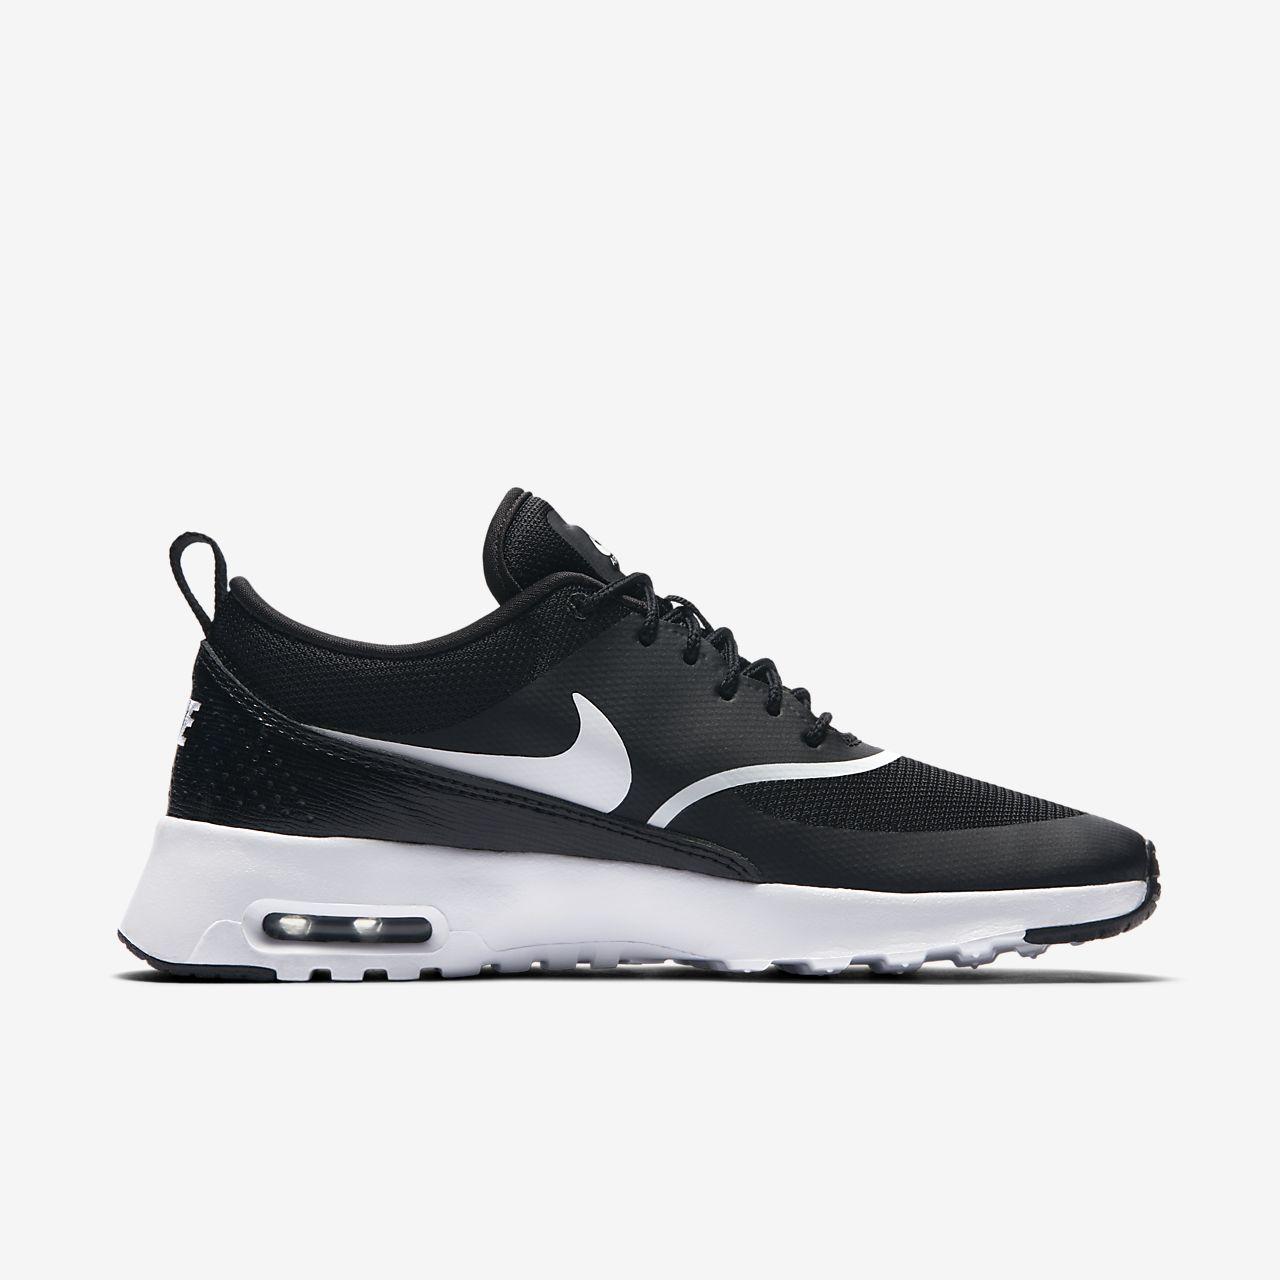 ... Nike Air Max Thea Damesschoen